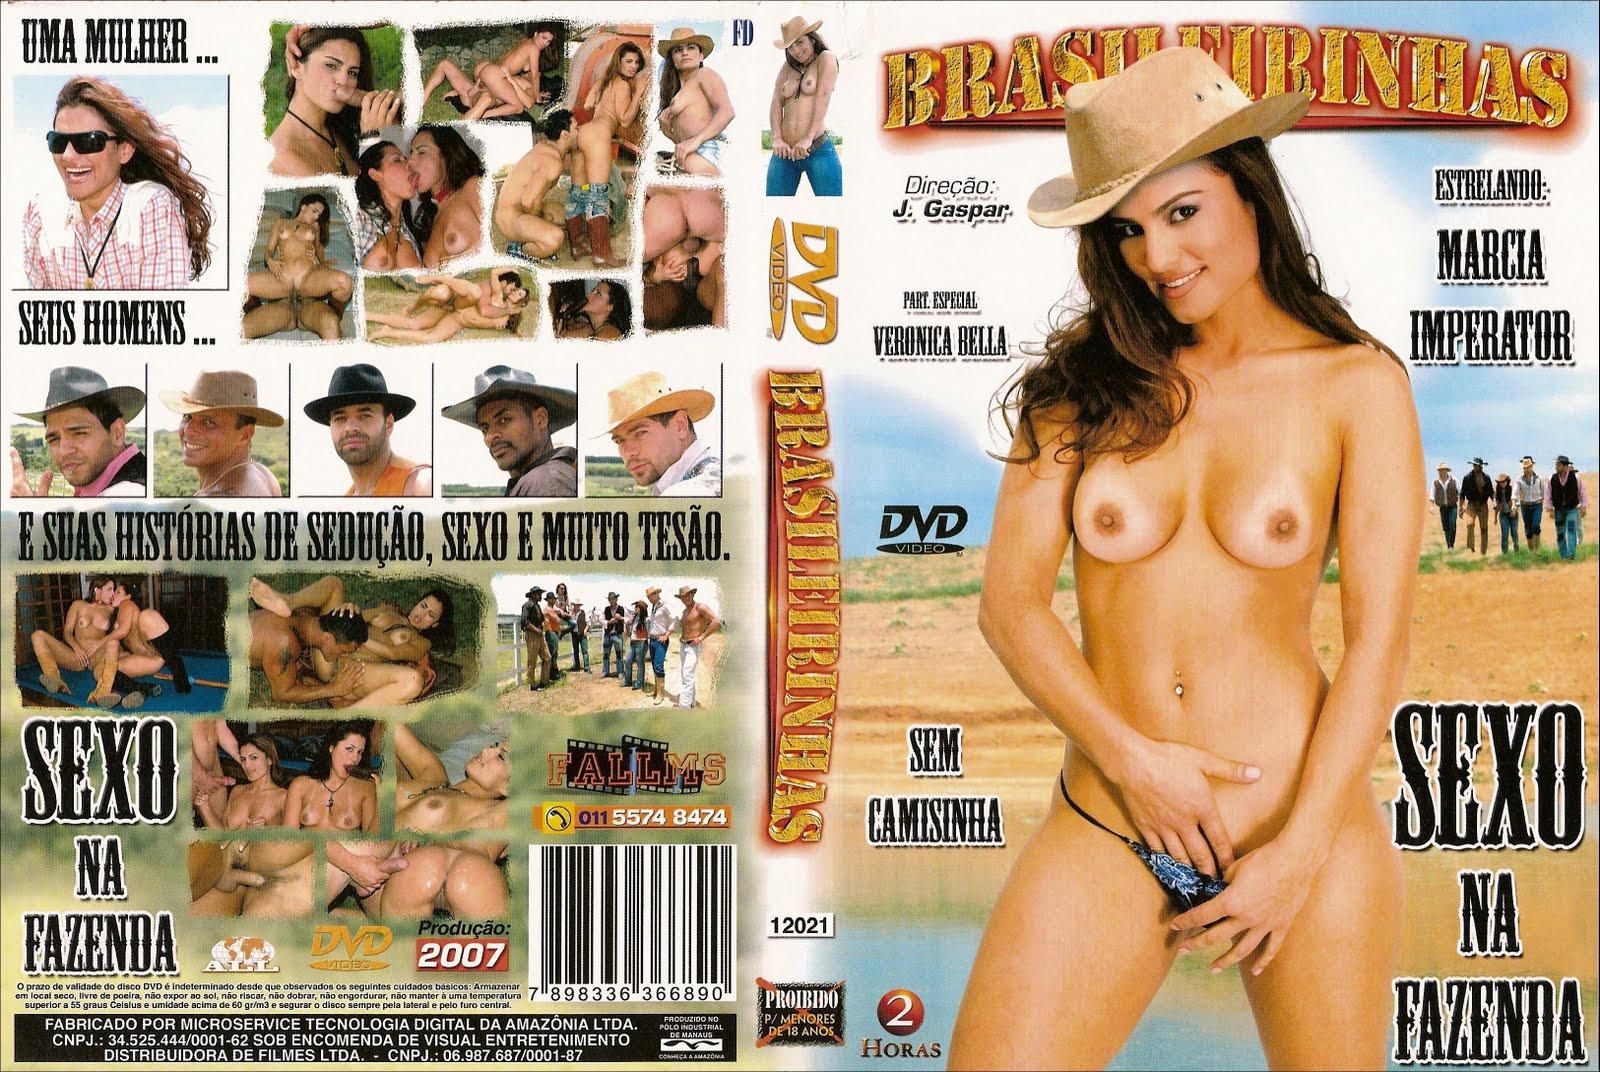 http://4.bp.blogspot.com/_VBbOD_SR0YU/TPp9ocHUNCI/AAAAAAAABnc/UVlhPFBlPyI/s1600/Sexo_Na_Fazenda___300_dpi.jpg